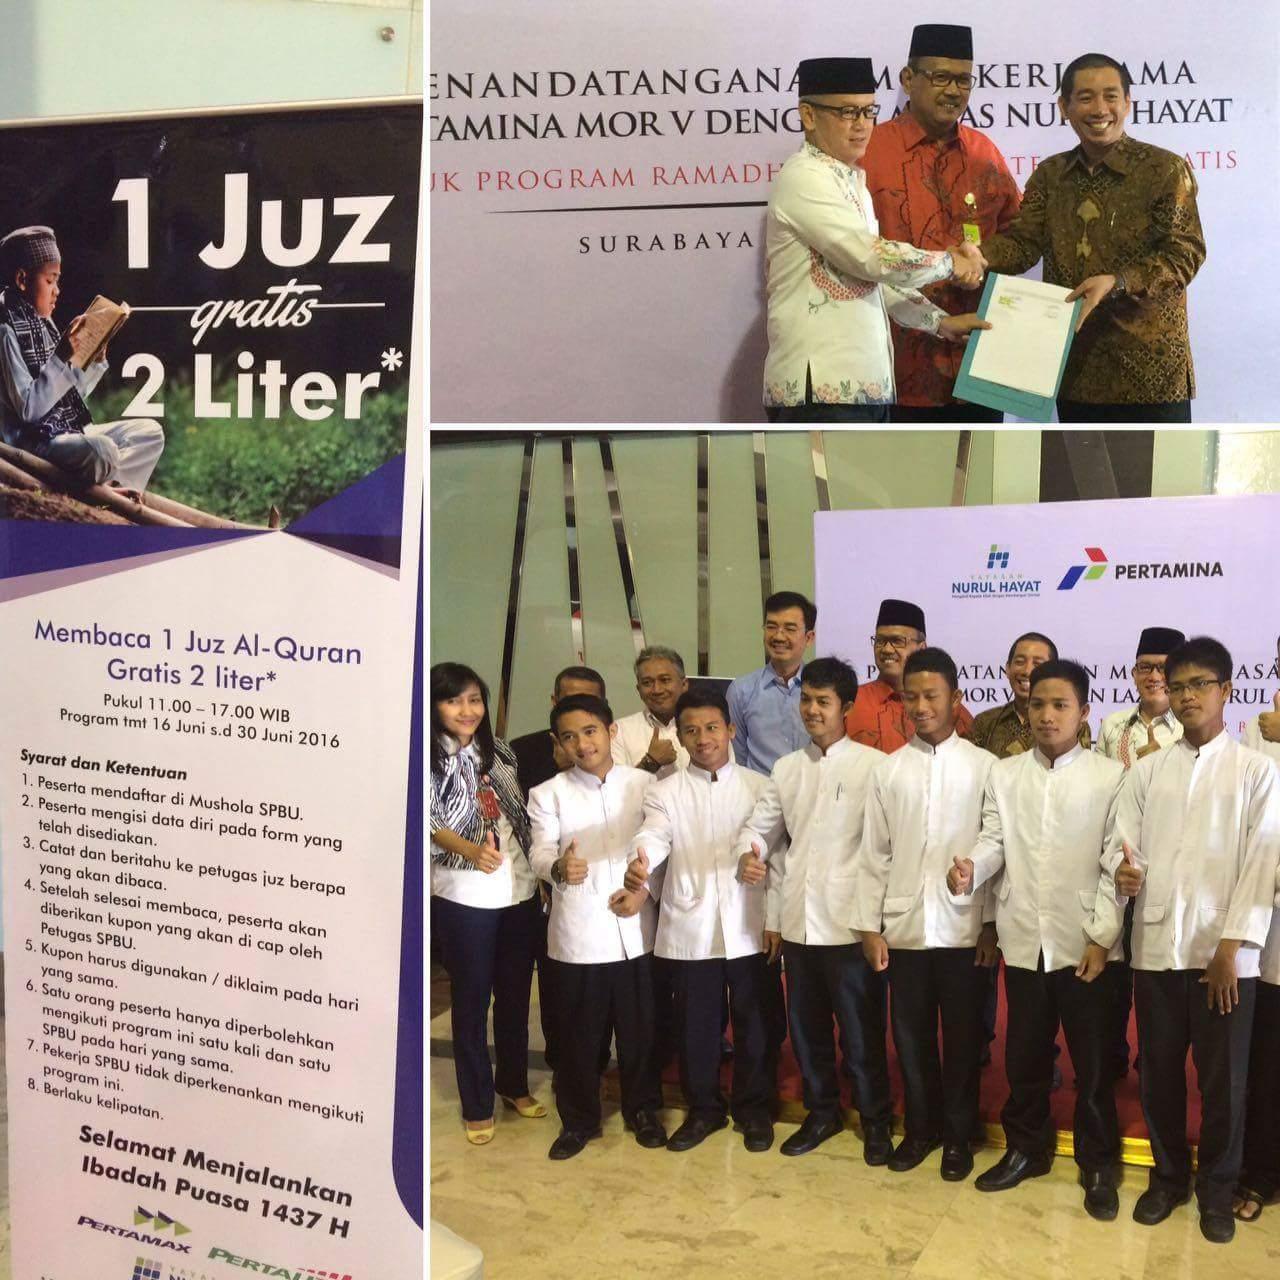 Program 1 juz 2 liter di Jawa Timur tahun 2016